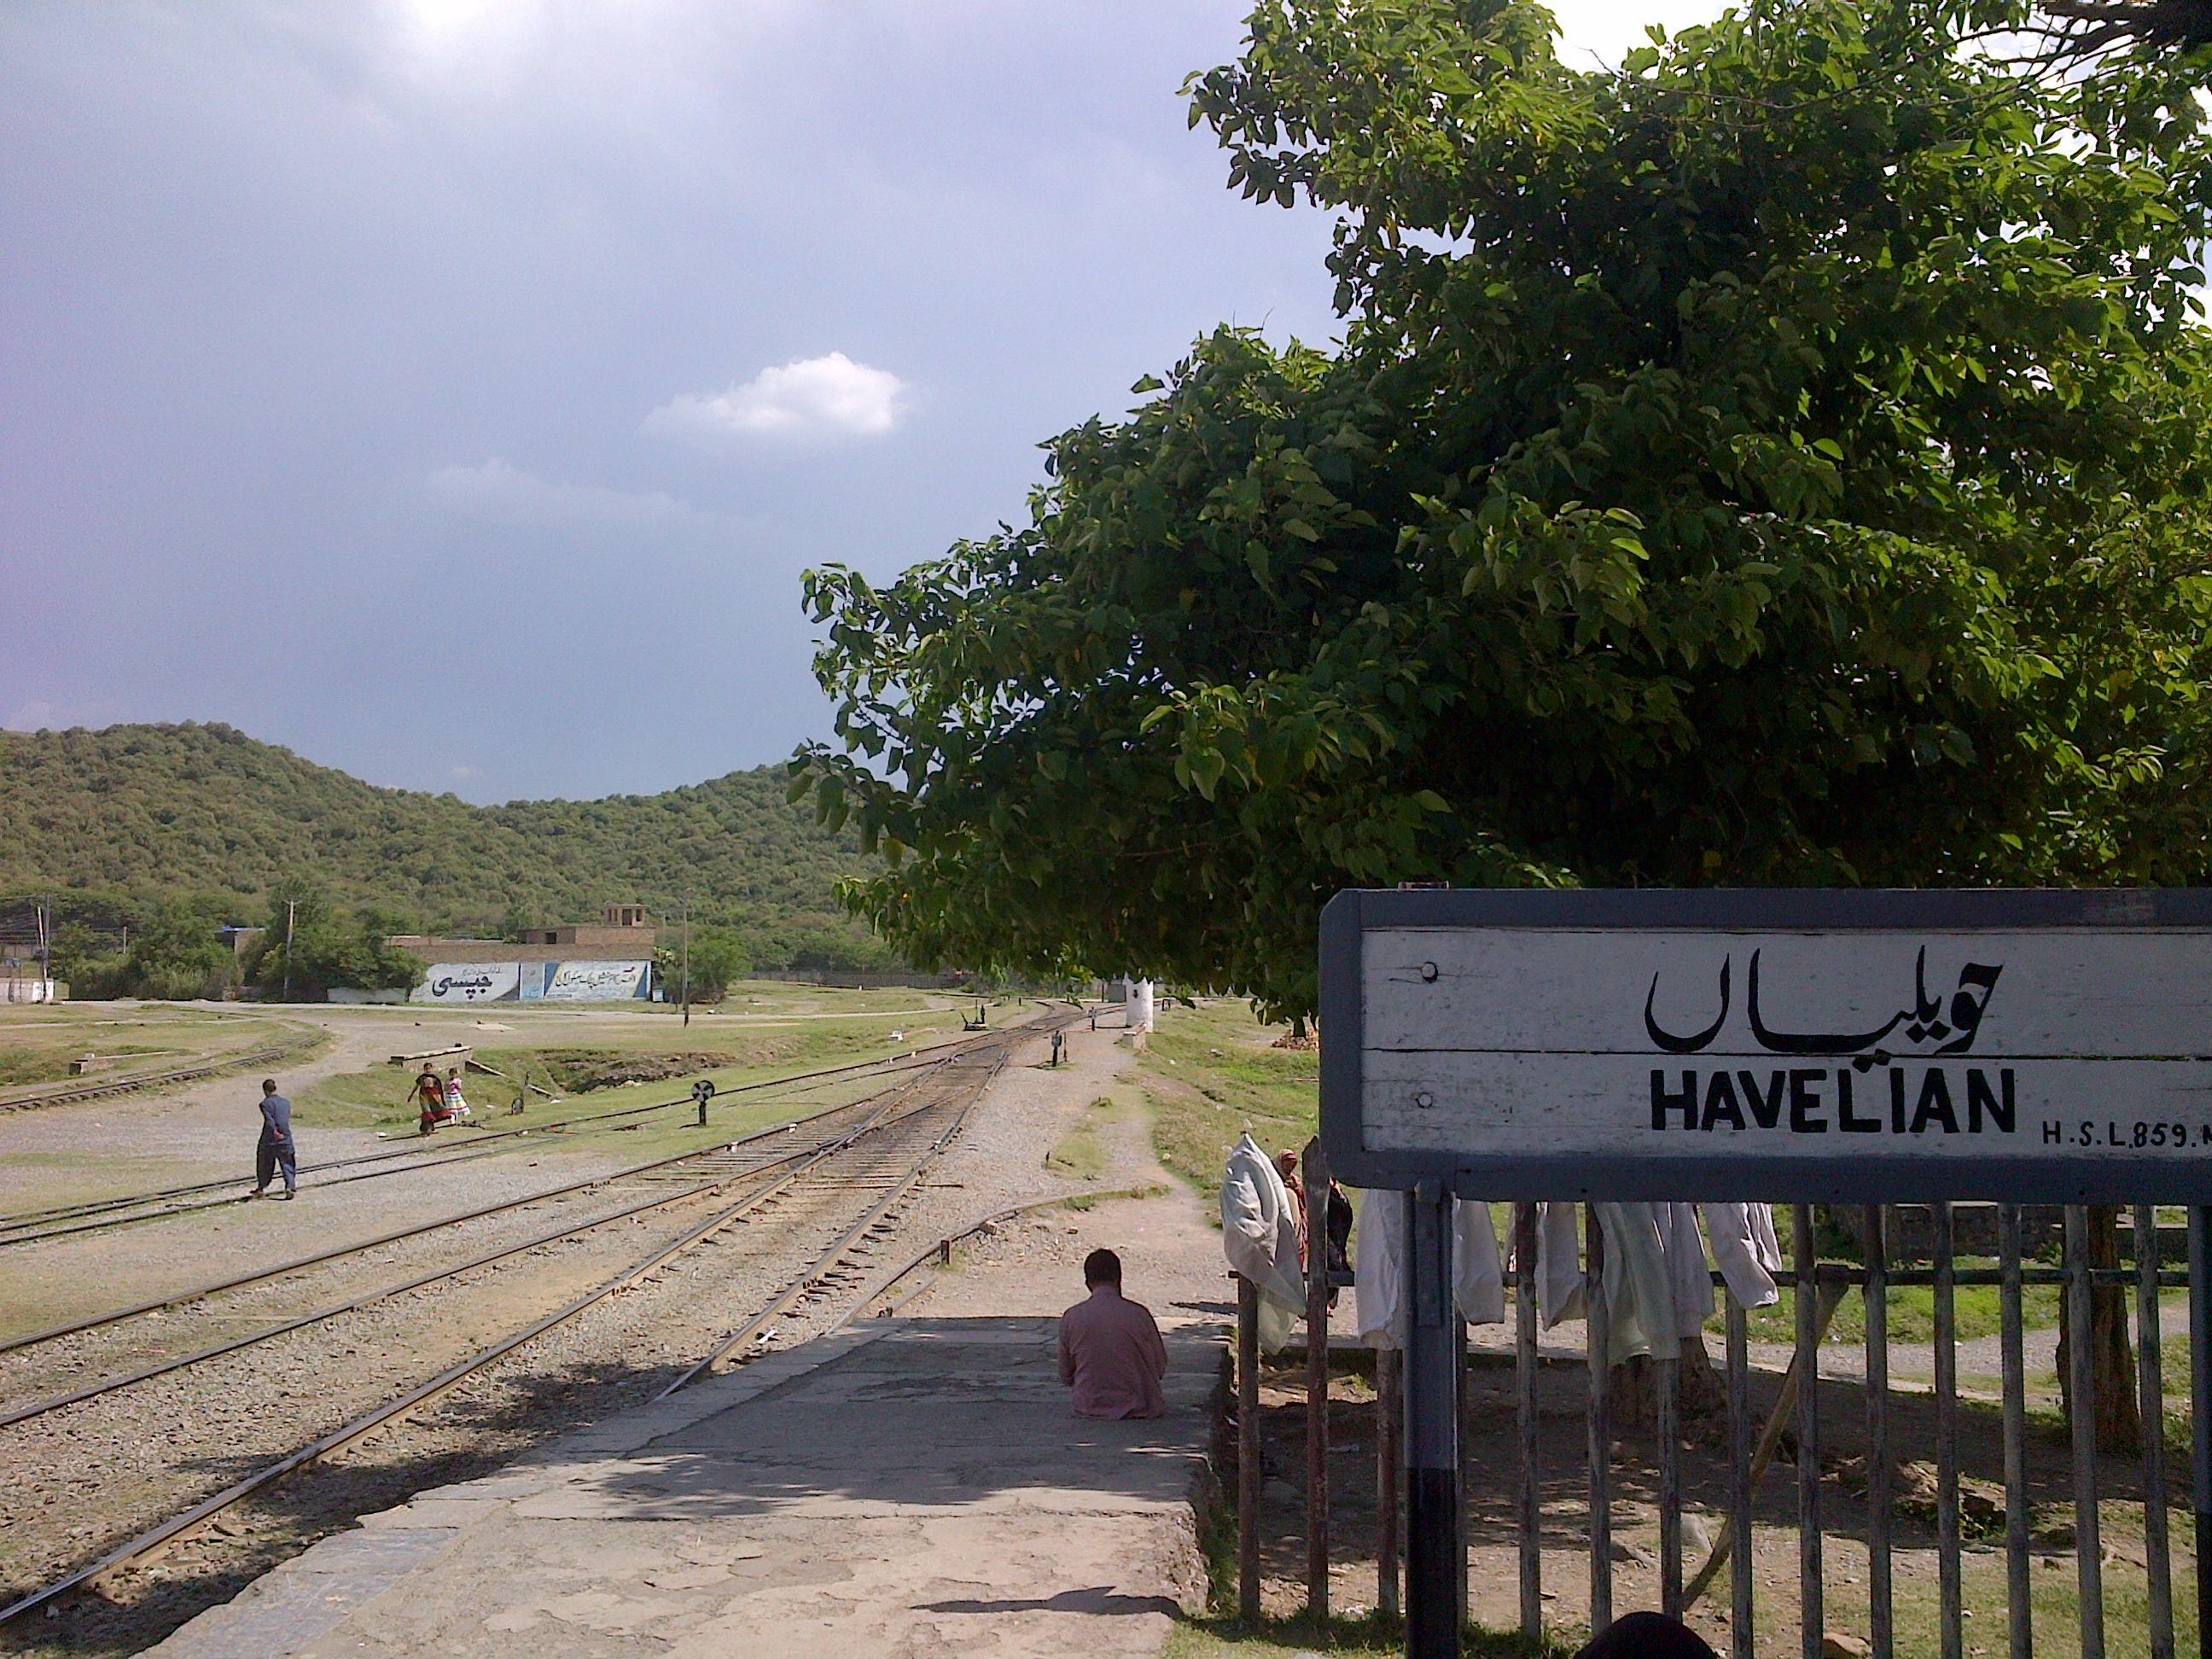 Havelian Railway Station - The north railway terminus in Pakistan